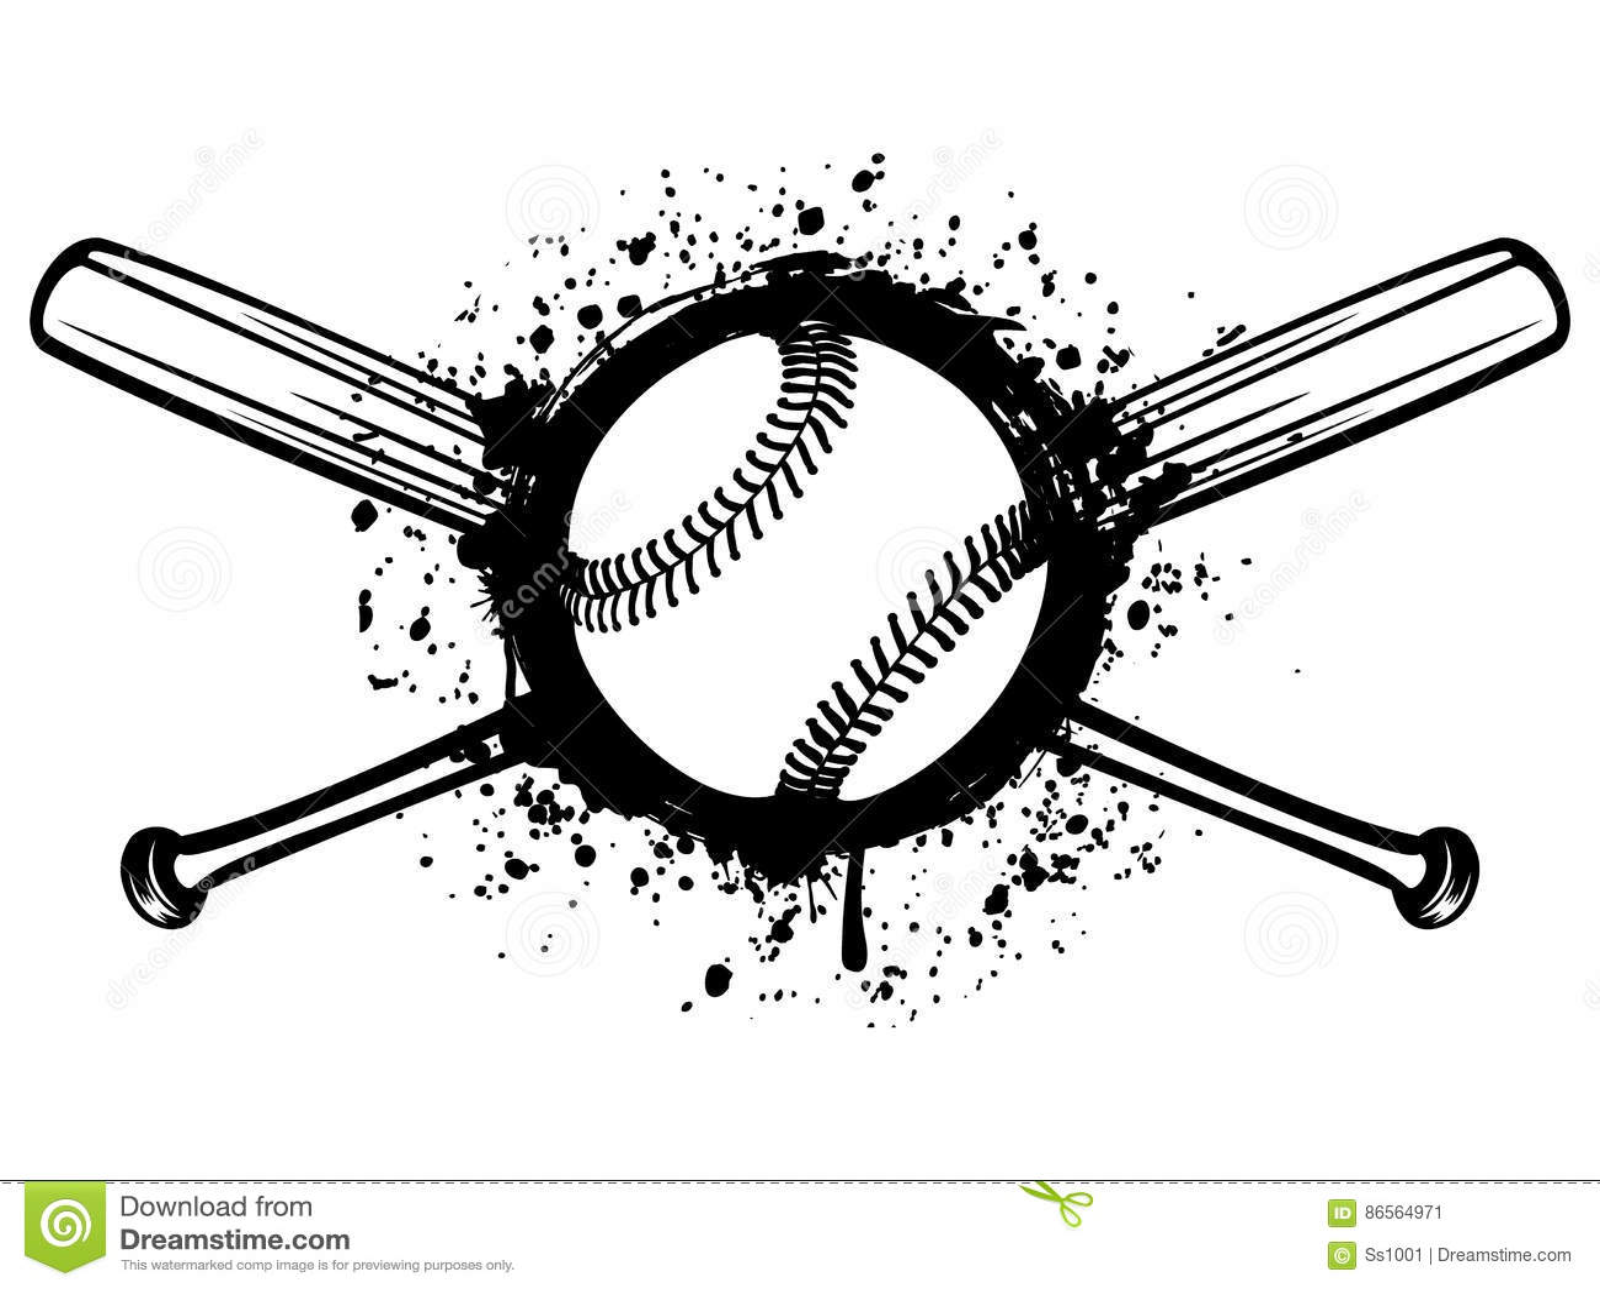 Baseball 1 stock vector. Illustration of pitch, insignia ...